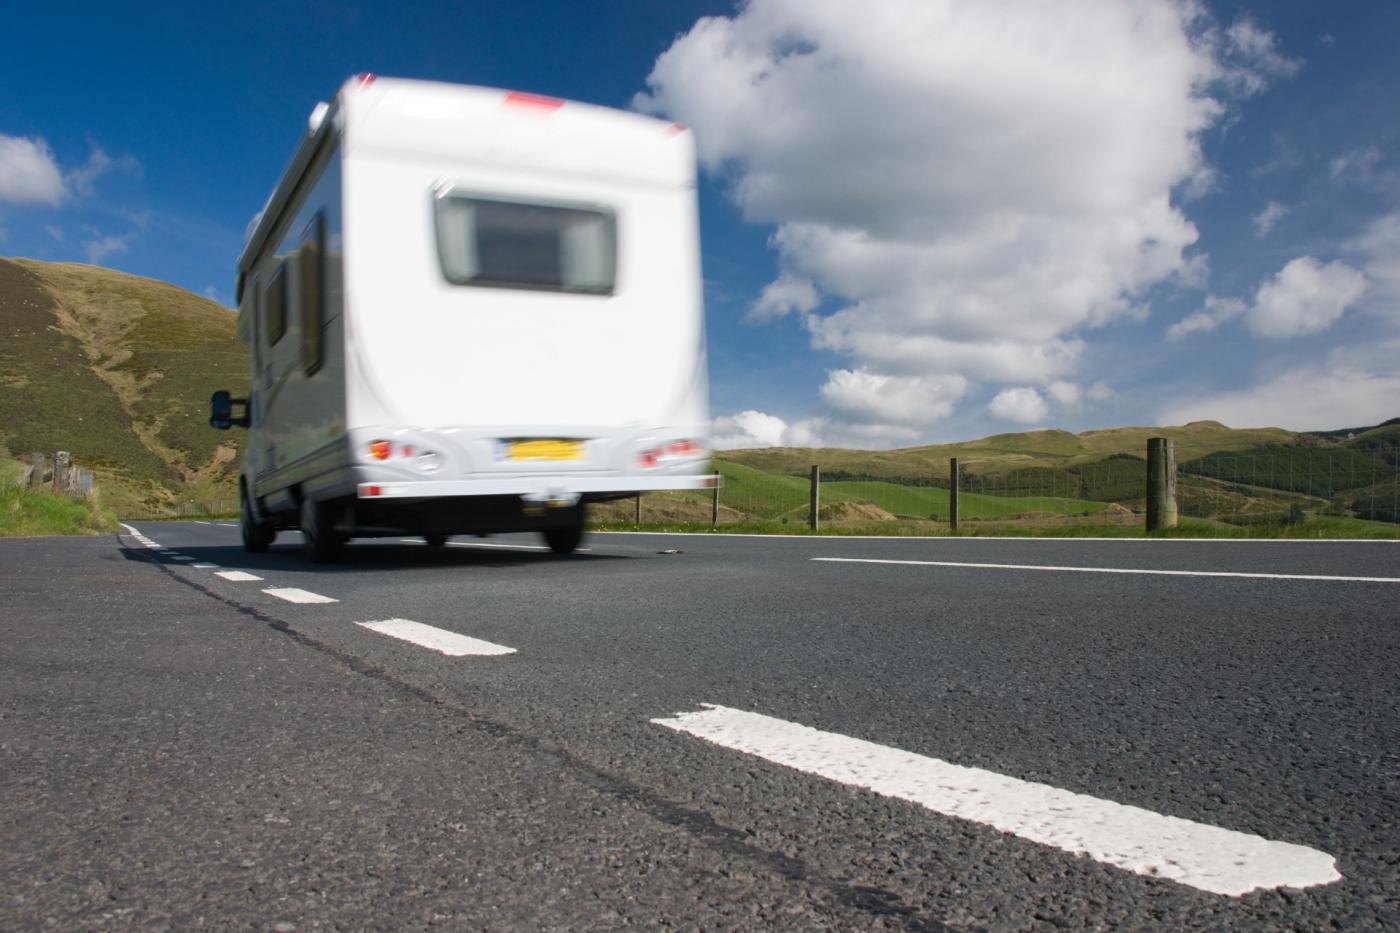 Motorhome driving on British road